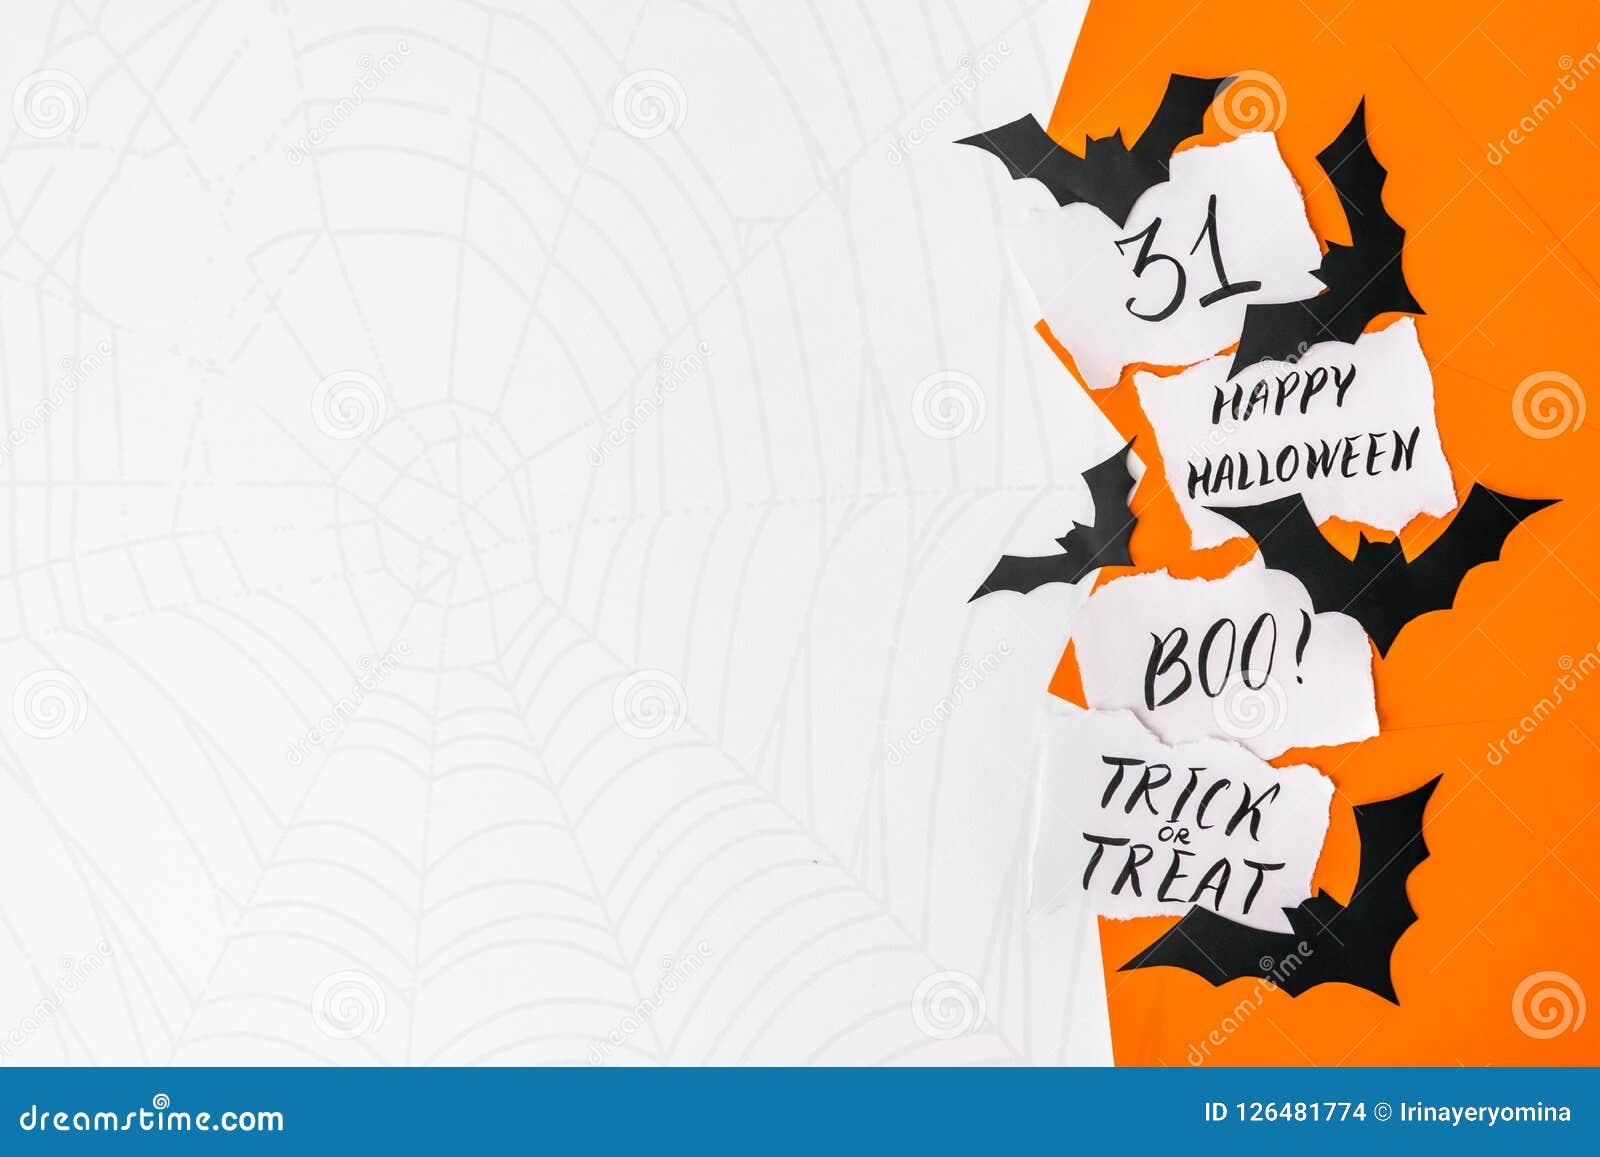 Halloween background, mockup. Card with text HAPPY HALLOWEEN, BO